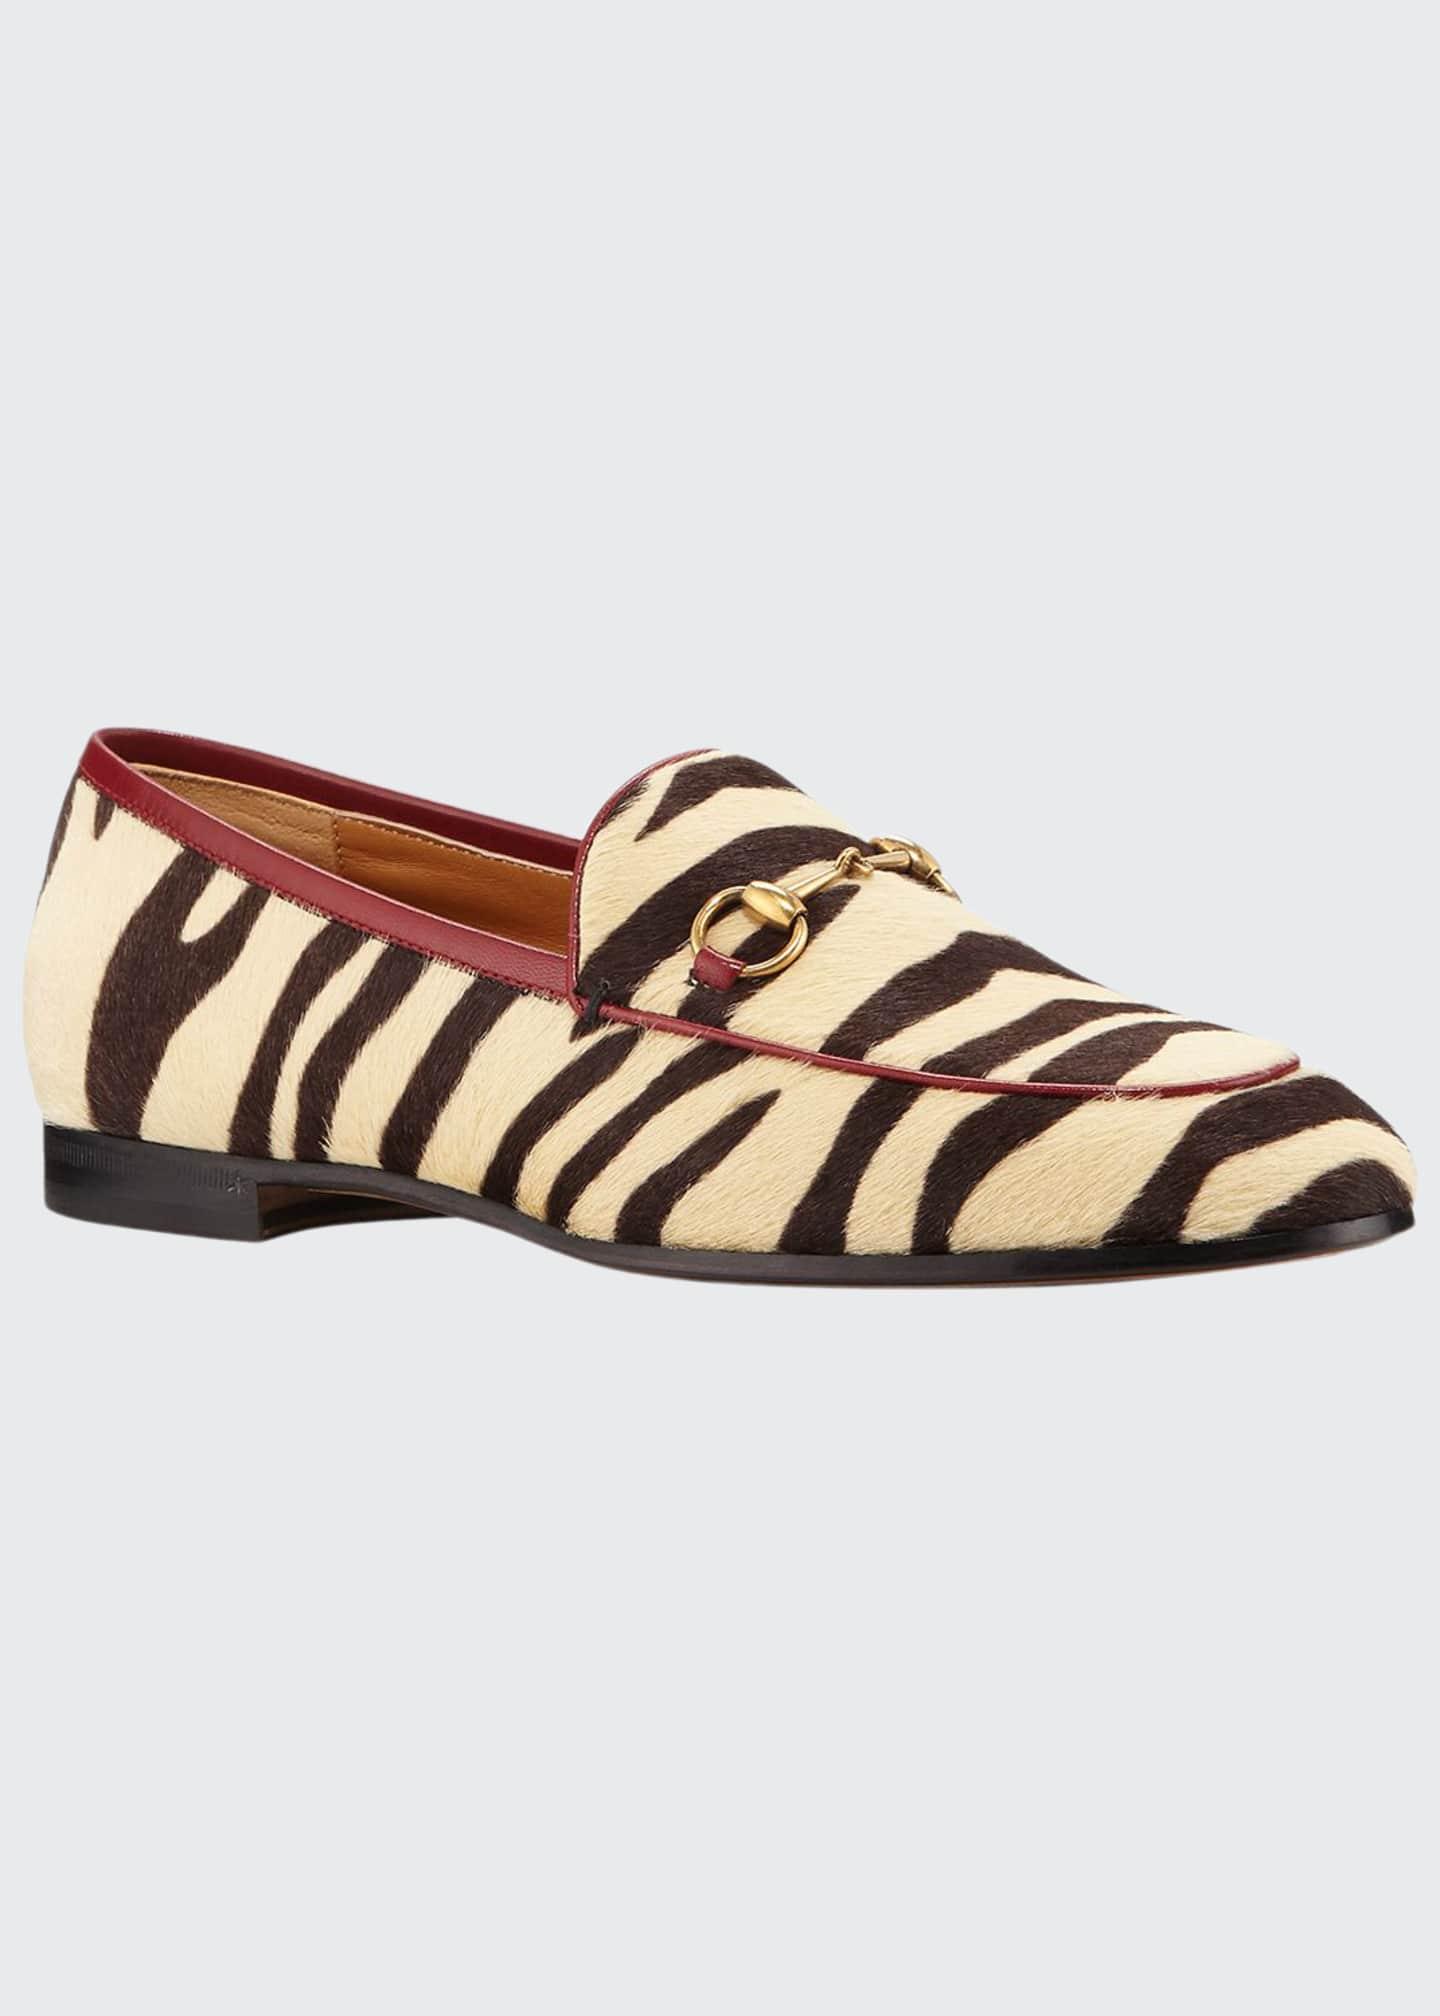 Gucci New Jordaan Zebra-Print Calf Hair Loafers